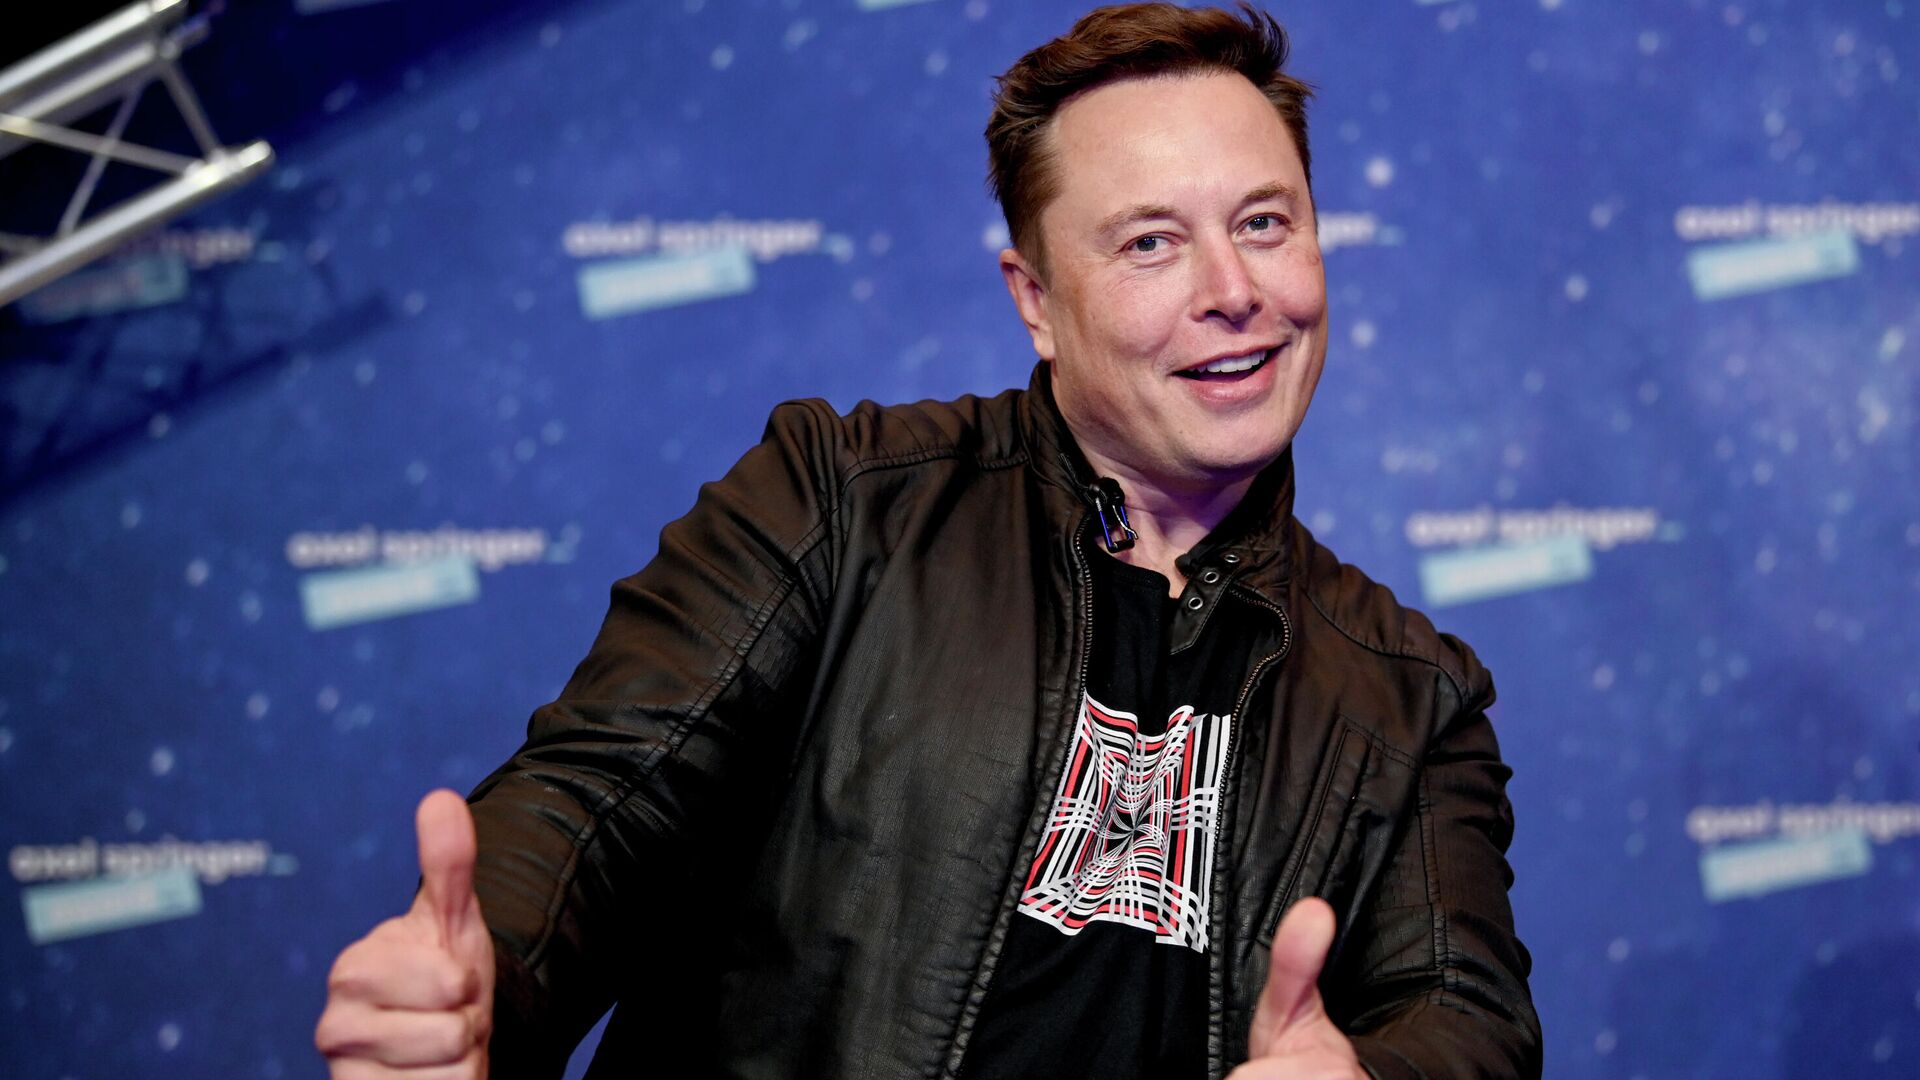 Глава компаний SpaceX и Tesla Илон Маск - РИА Новости, 1920, 30.07.2021